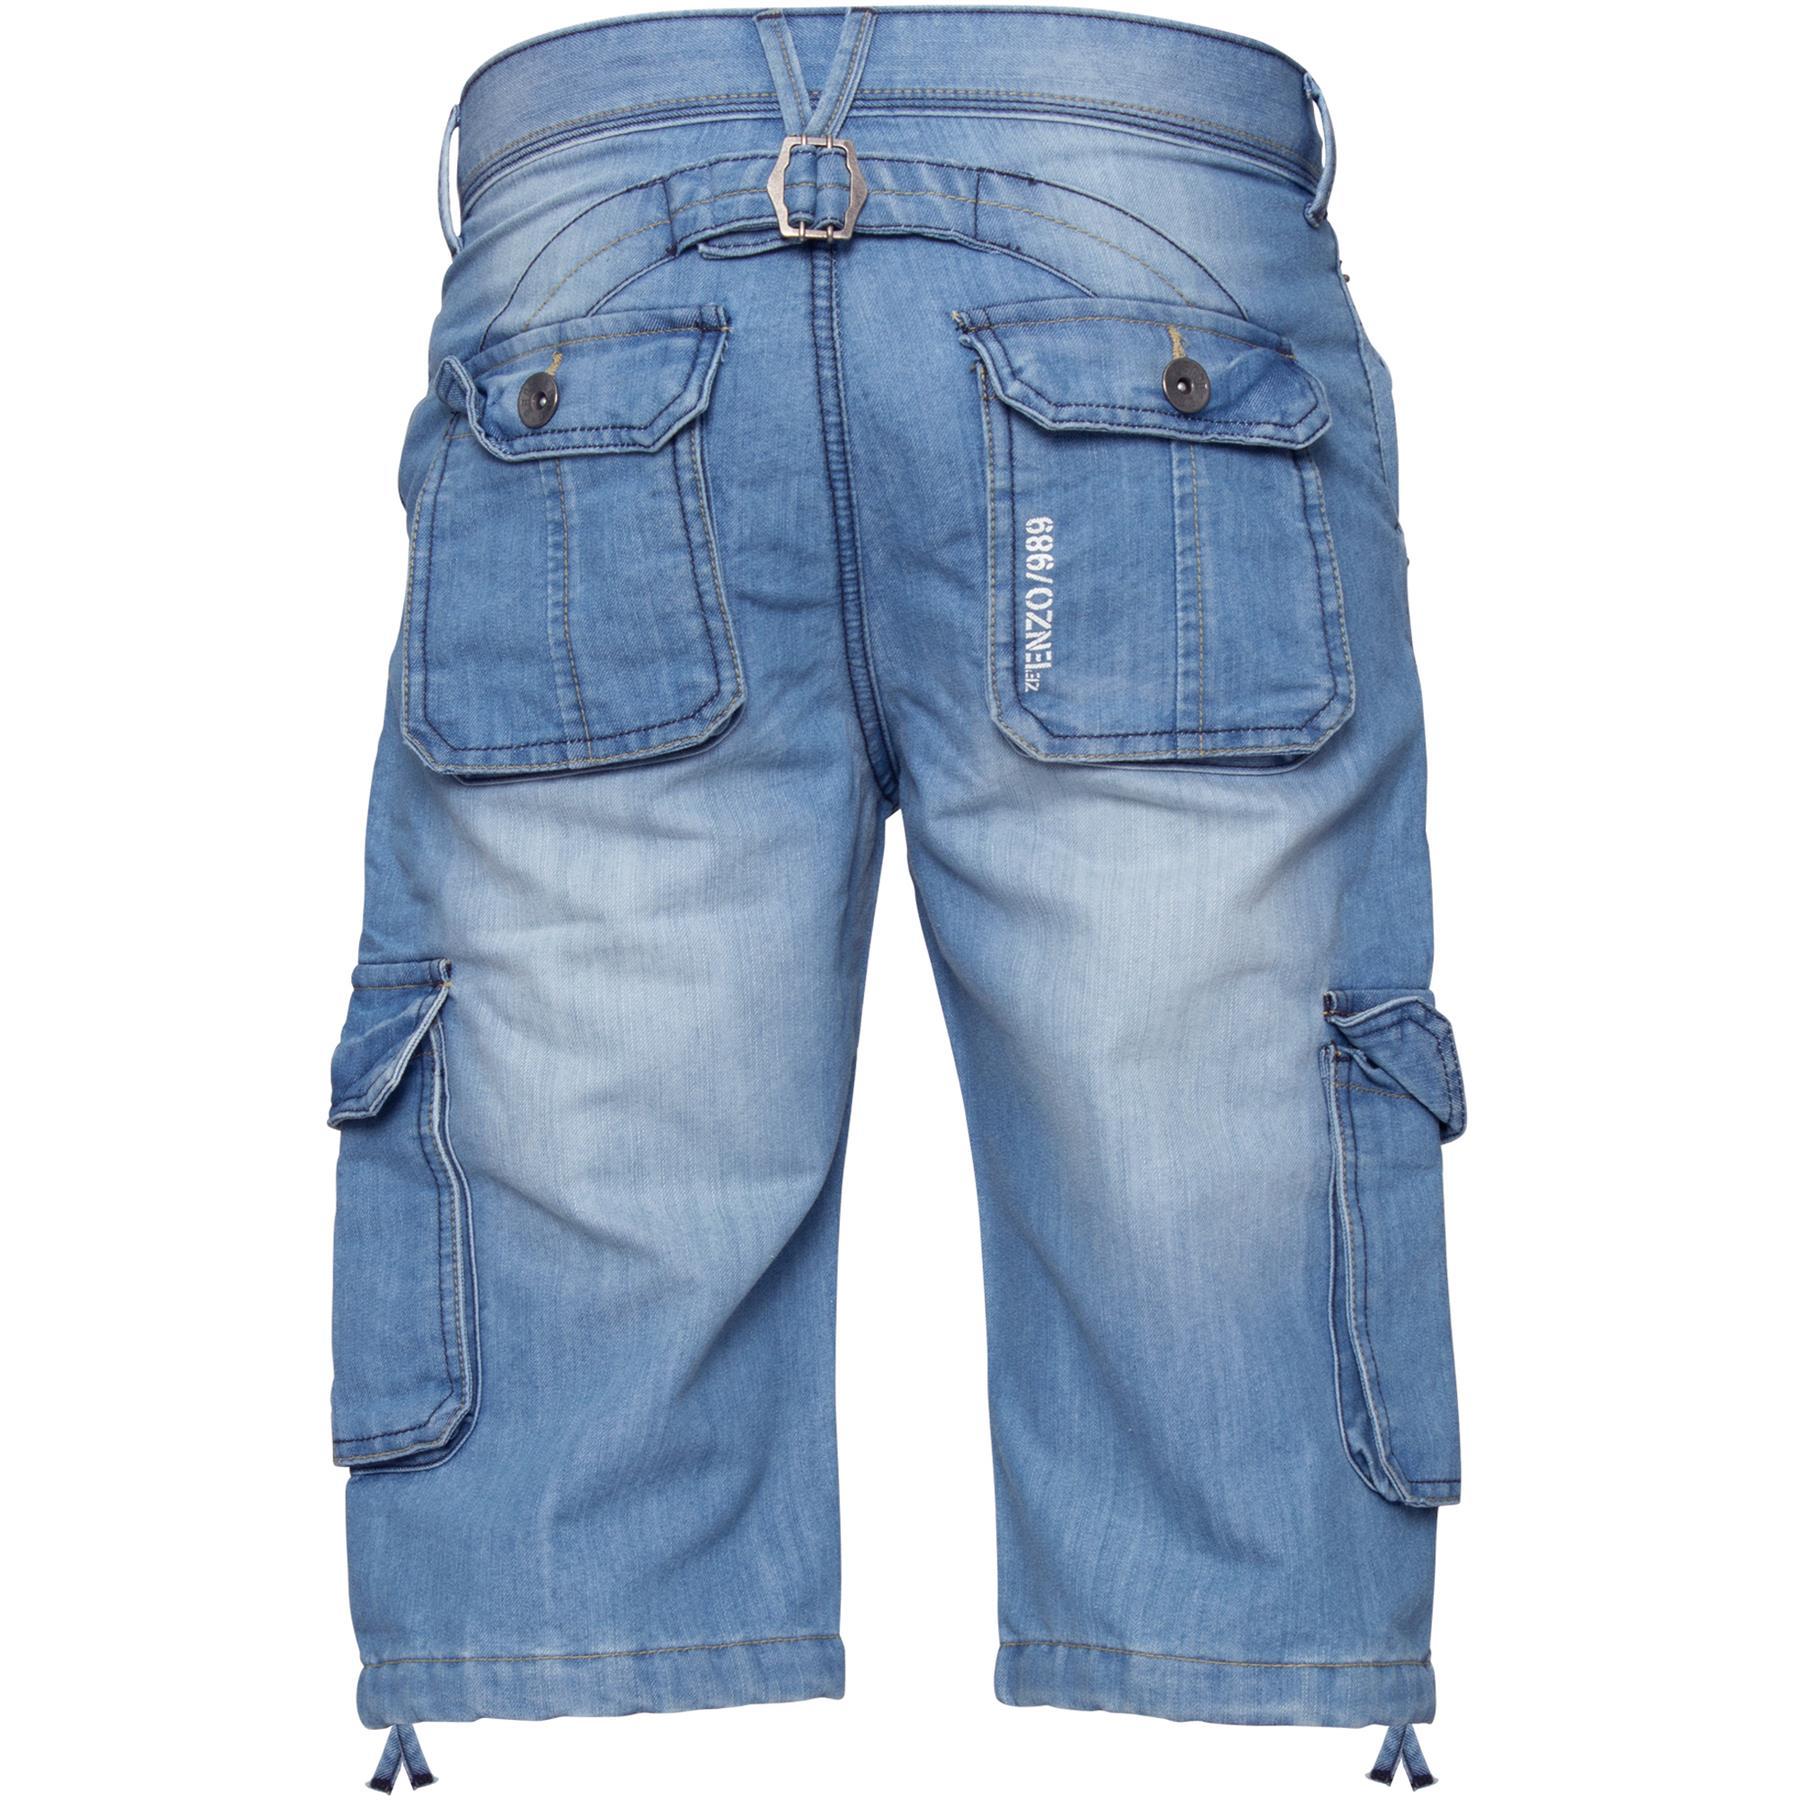 ENZO-Jeans-para-hombre-de-carga-combate-informal-de-verano-Shorts-Pantalones-Cortos-de-Jeans-Todas miniatura 12